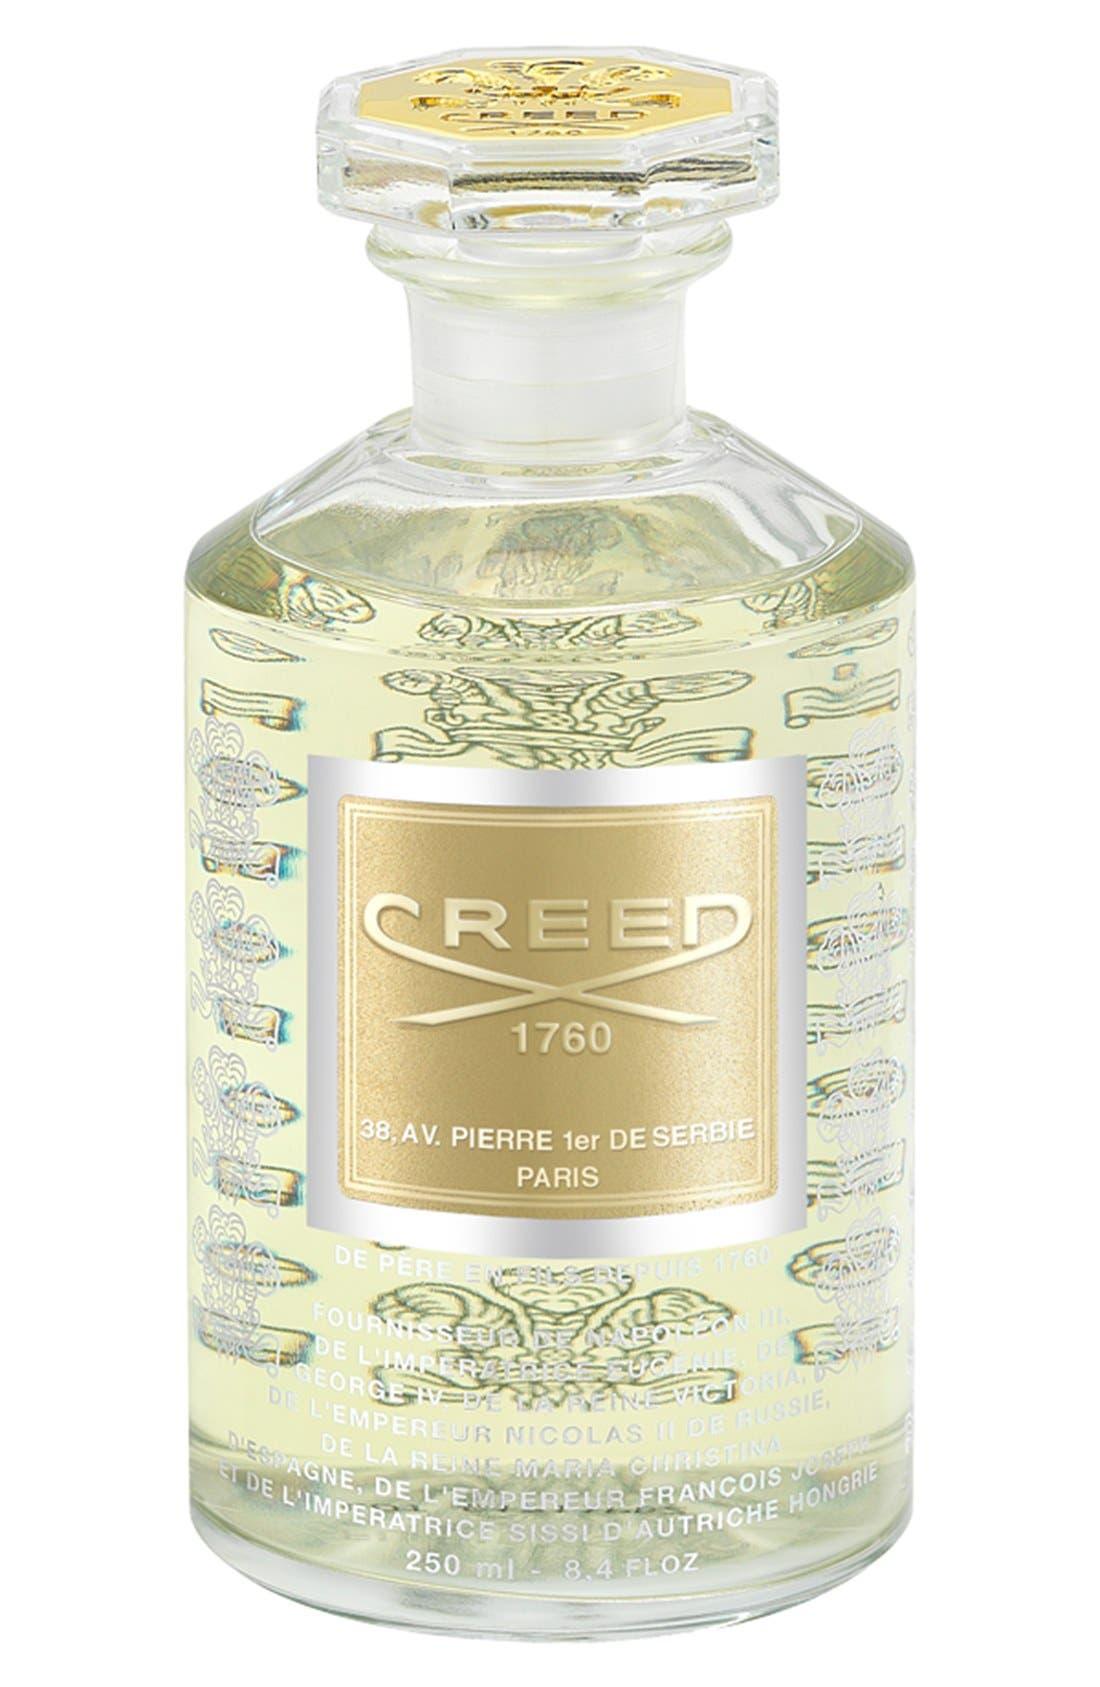 Creed 'Fleurissimo' Fragrance (8.4 oz.)